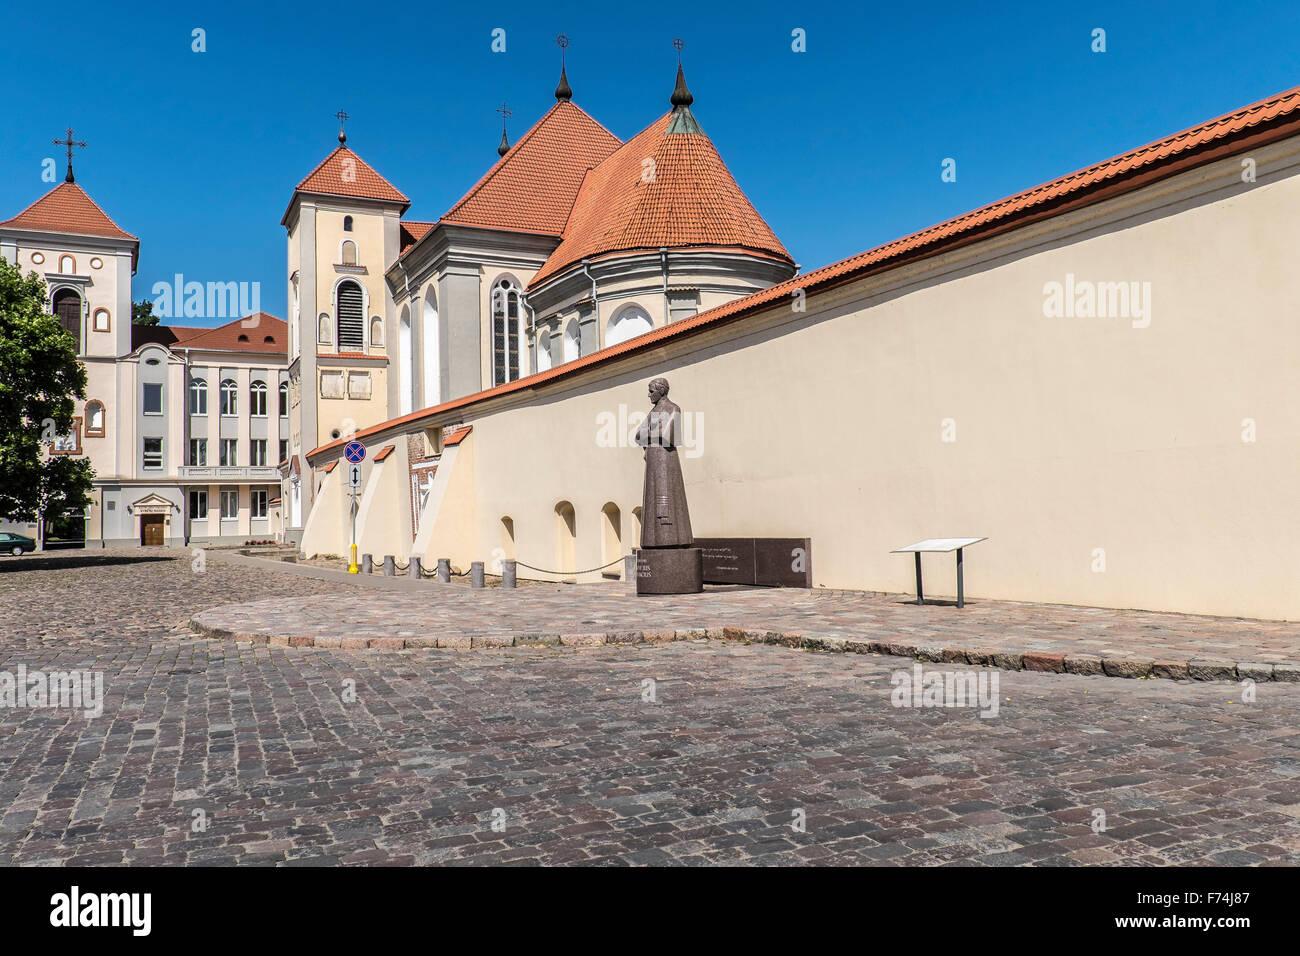 Guest House of Kaunas Archdiocese, Kaunas, Lithuania - Stock Image